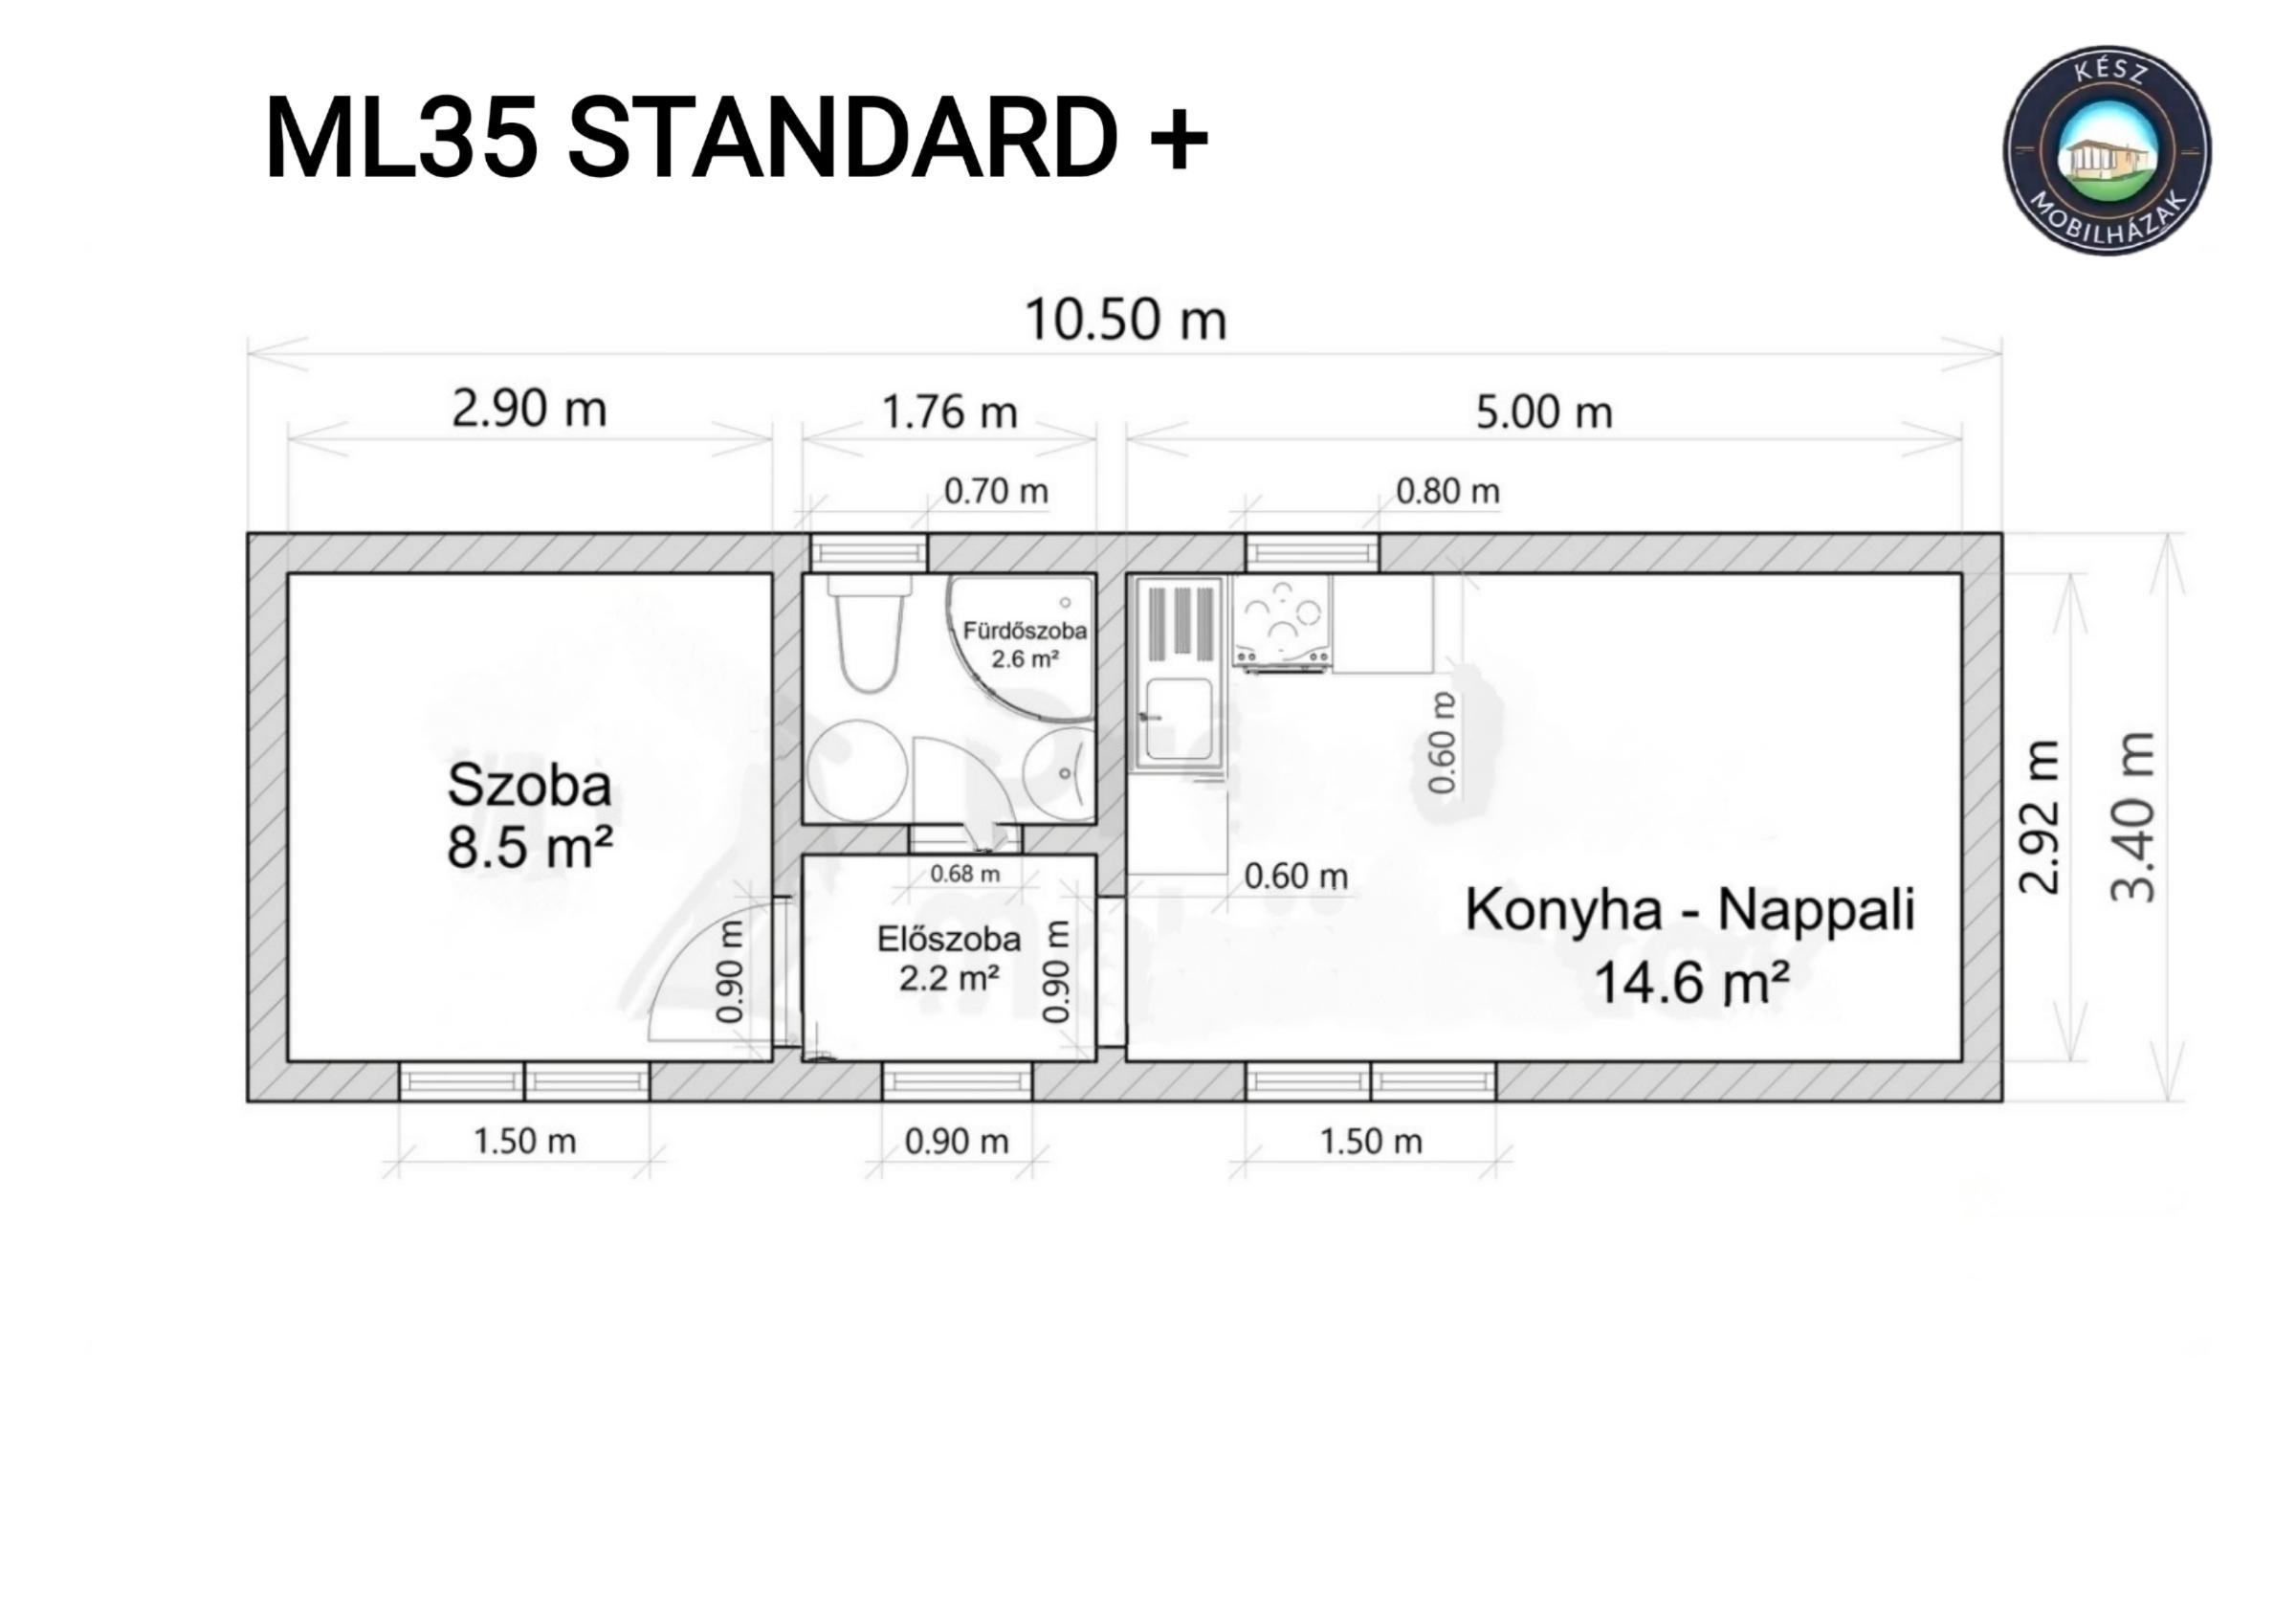 ML35 STANDARD+